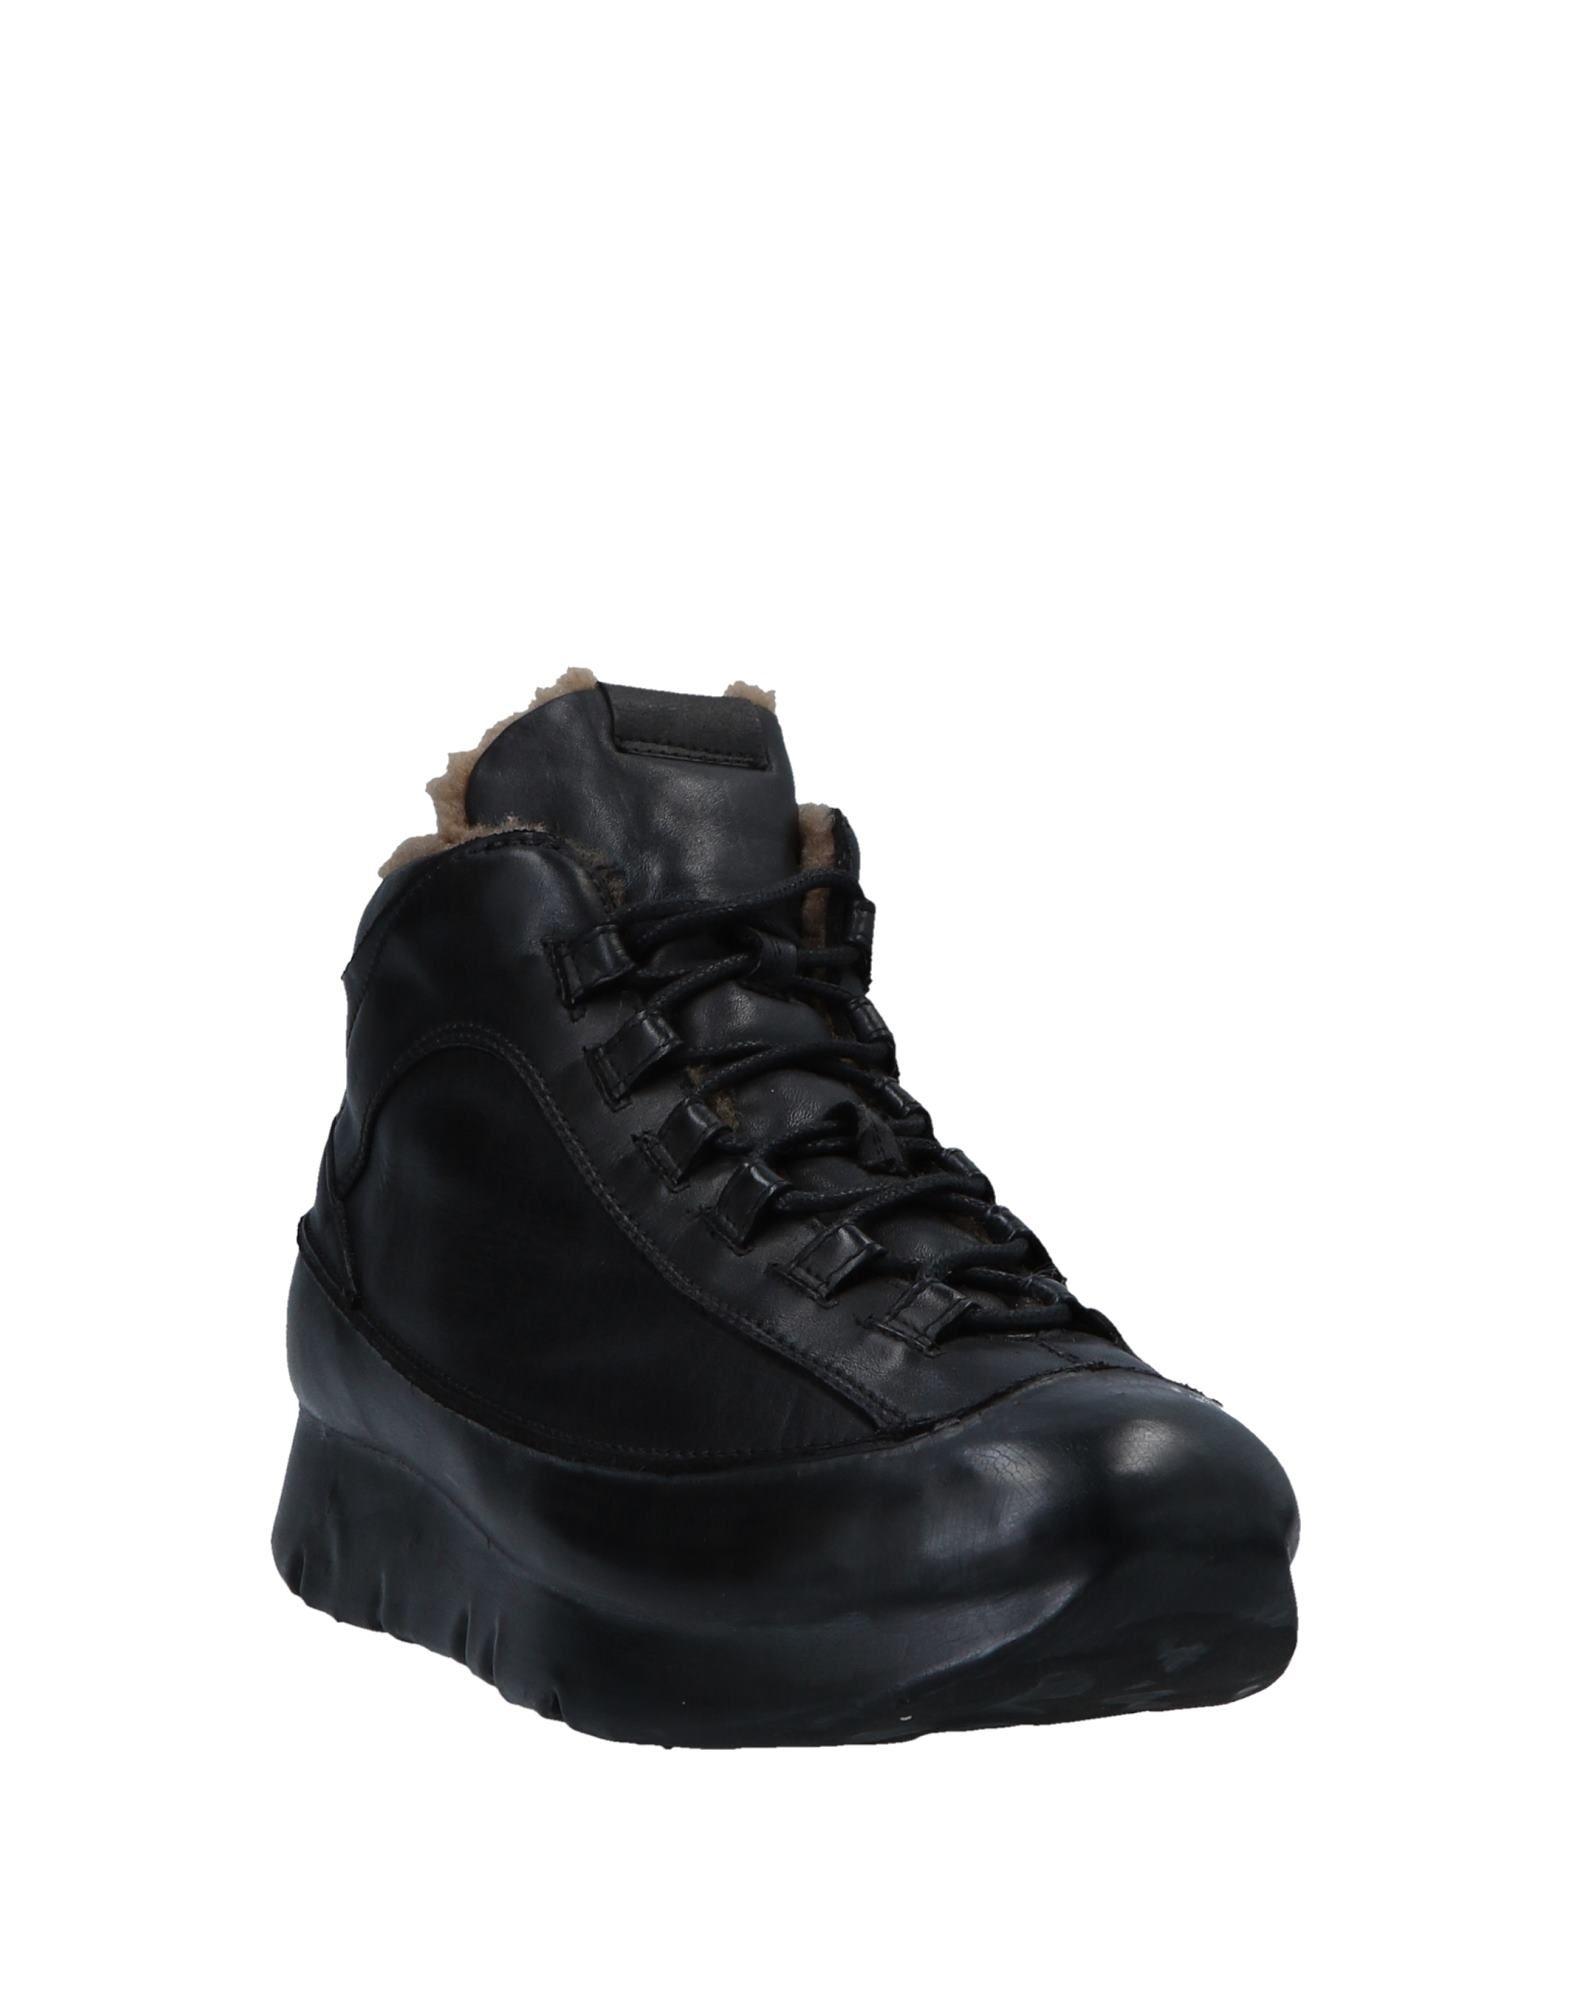 Rubber Soul Sneakers Qualität Herren  11554236OM Gute Qualität Sneakers beliebte Schuhe 3caefe